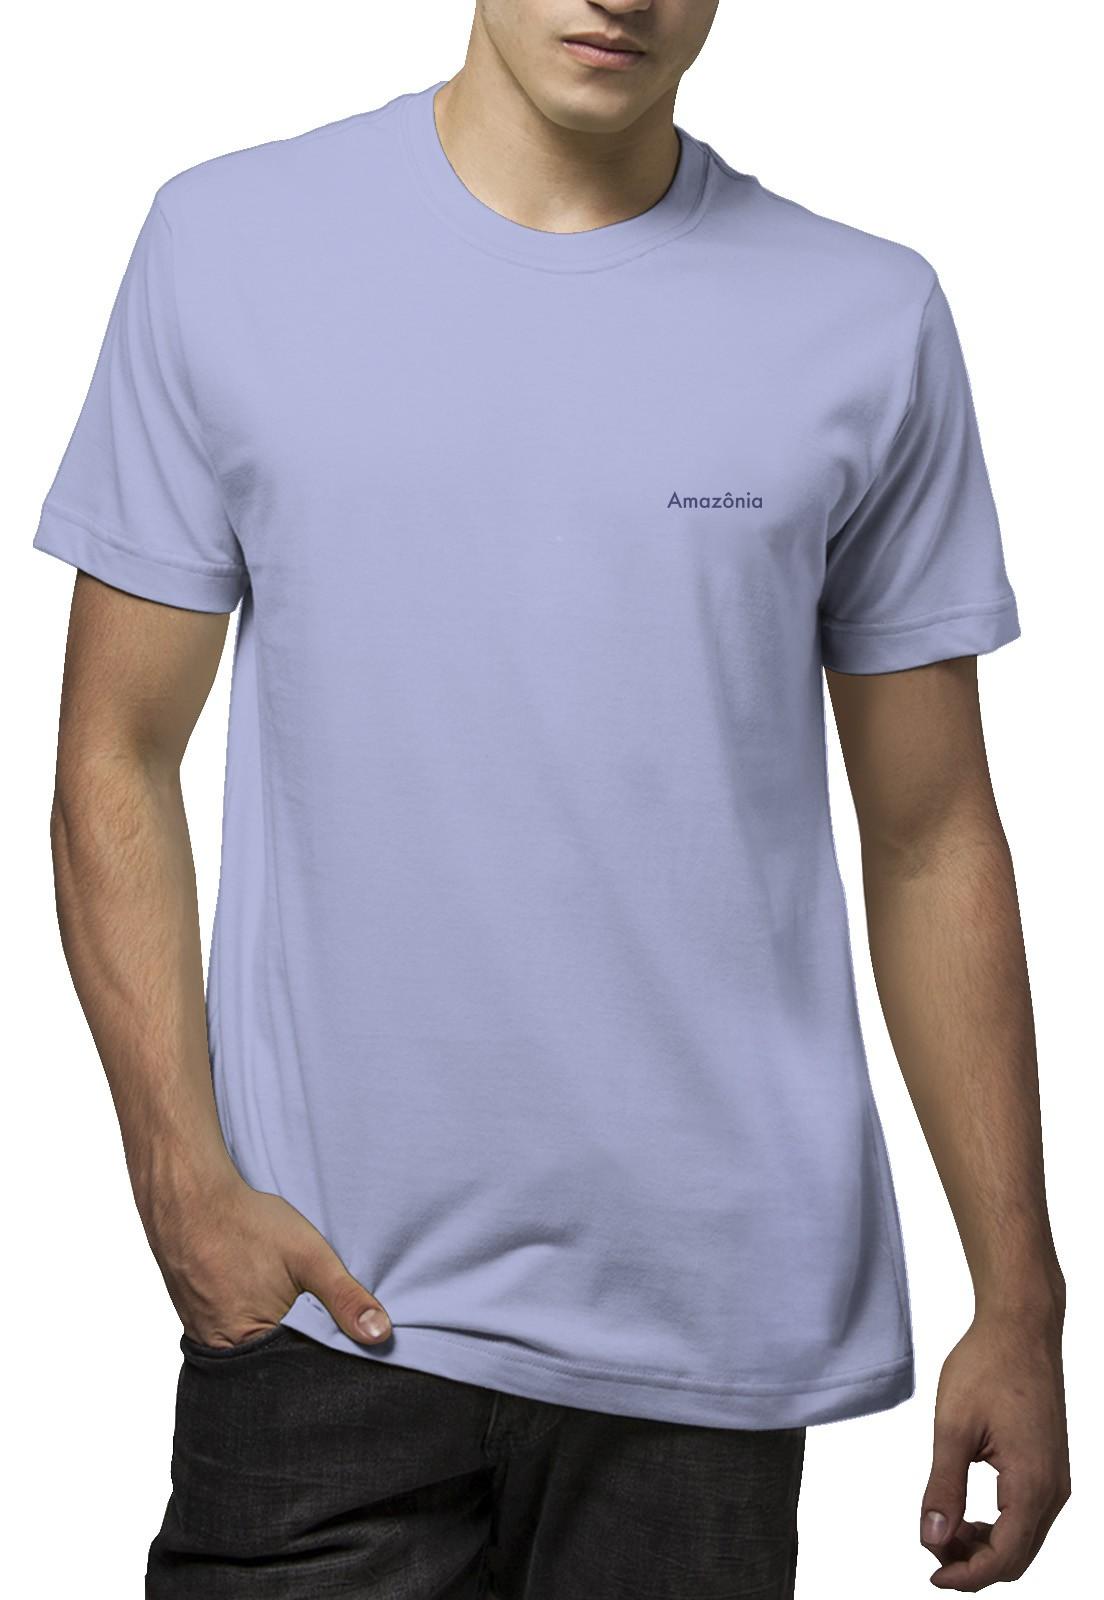 Camiseta Amazônia Caule Folha - Azul